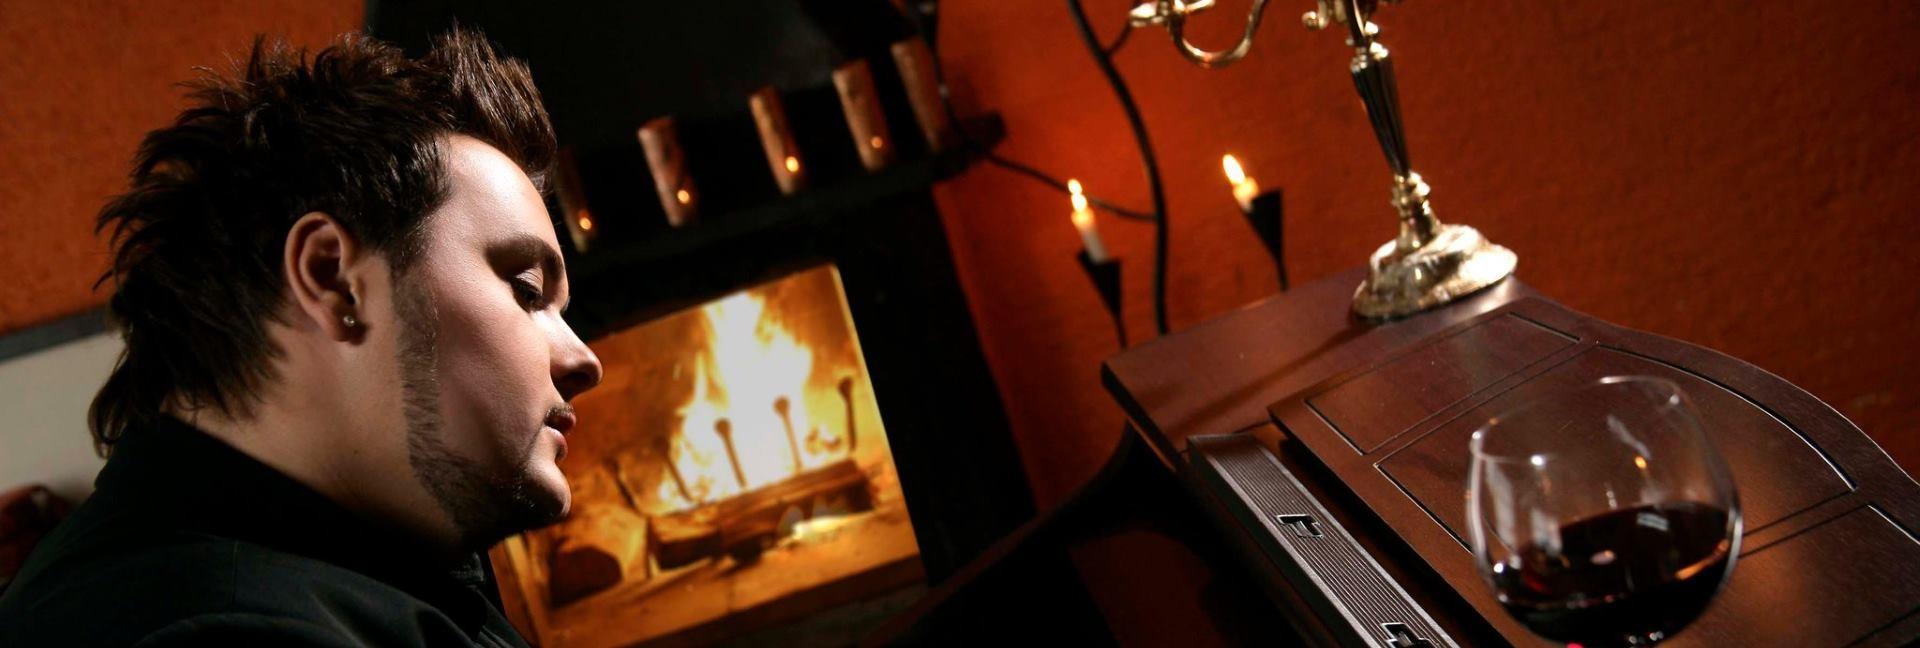 VIDEO: JACQUES HOUDEK najavljuje veliki ROĐENDANSKI KONCERT u KD Lisinski na dan 14. travnja